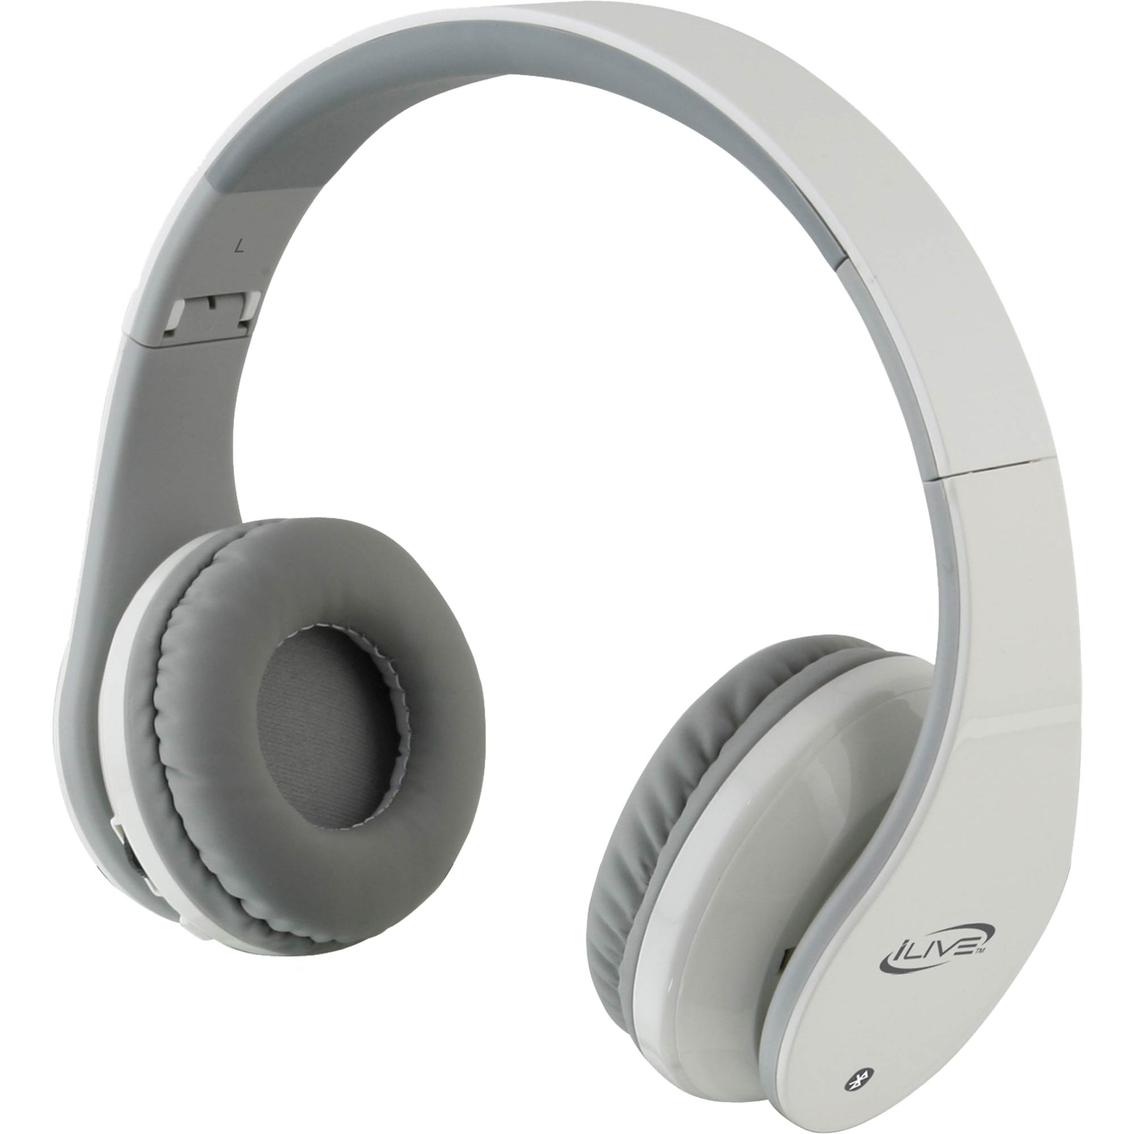 Purple bluetooth headphones neckband - iLive IAHB64 - headset Overview